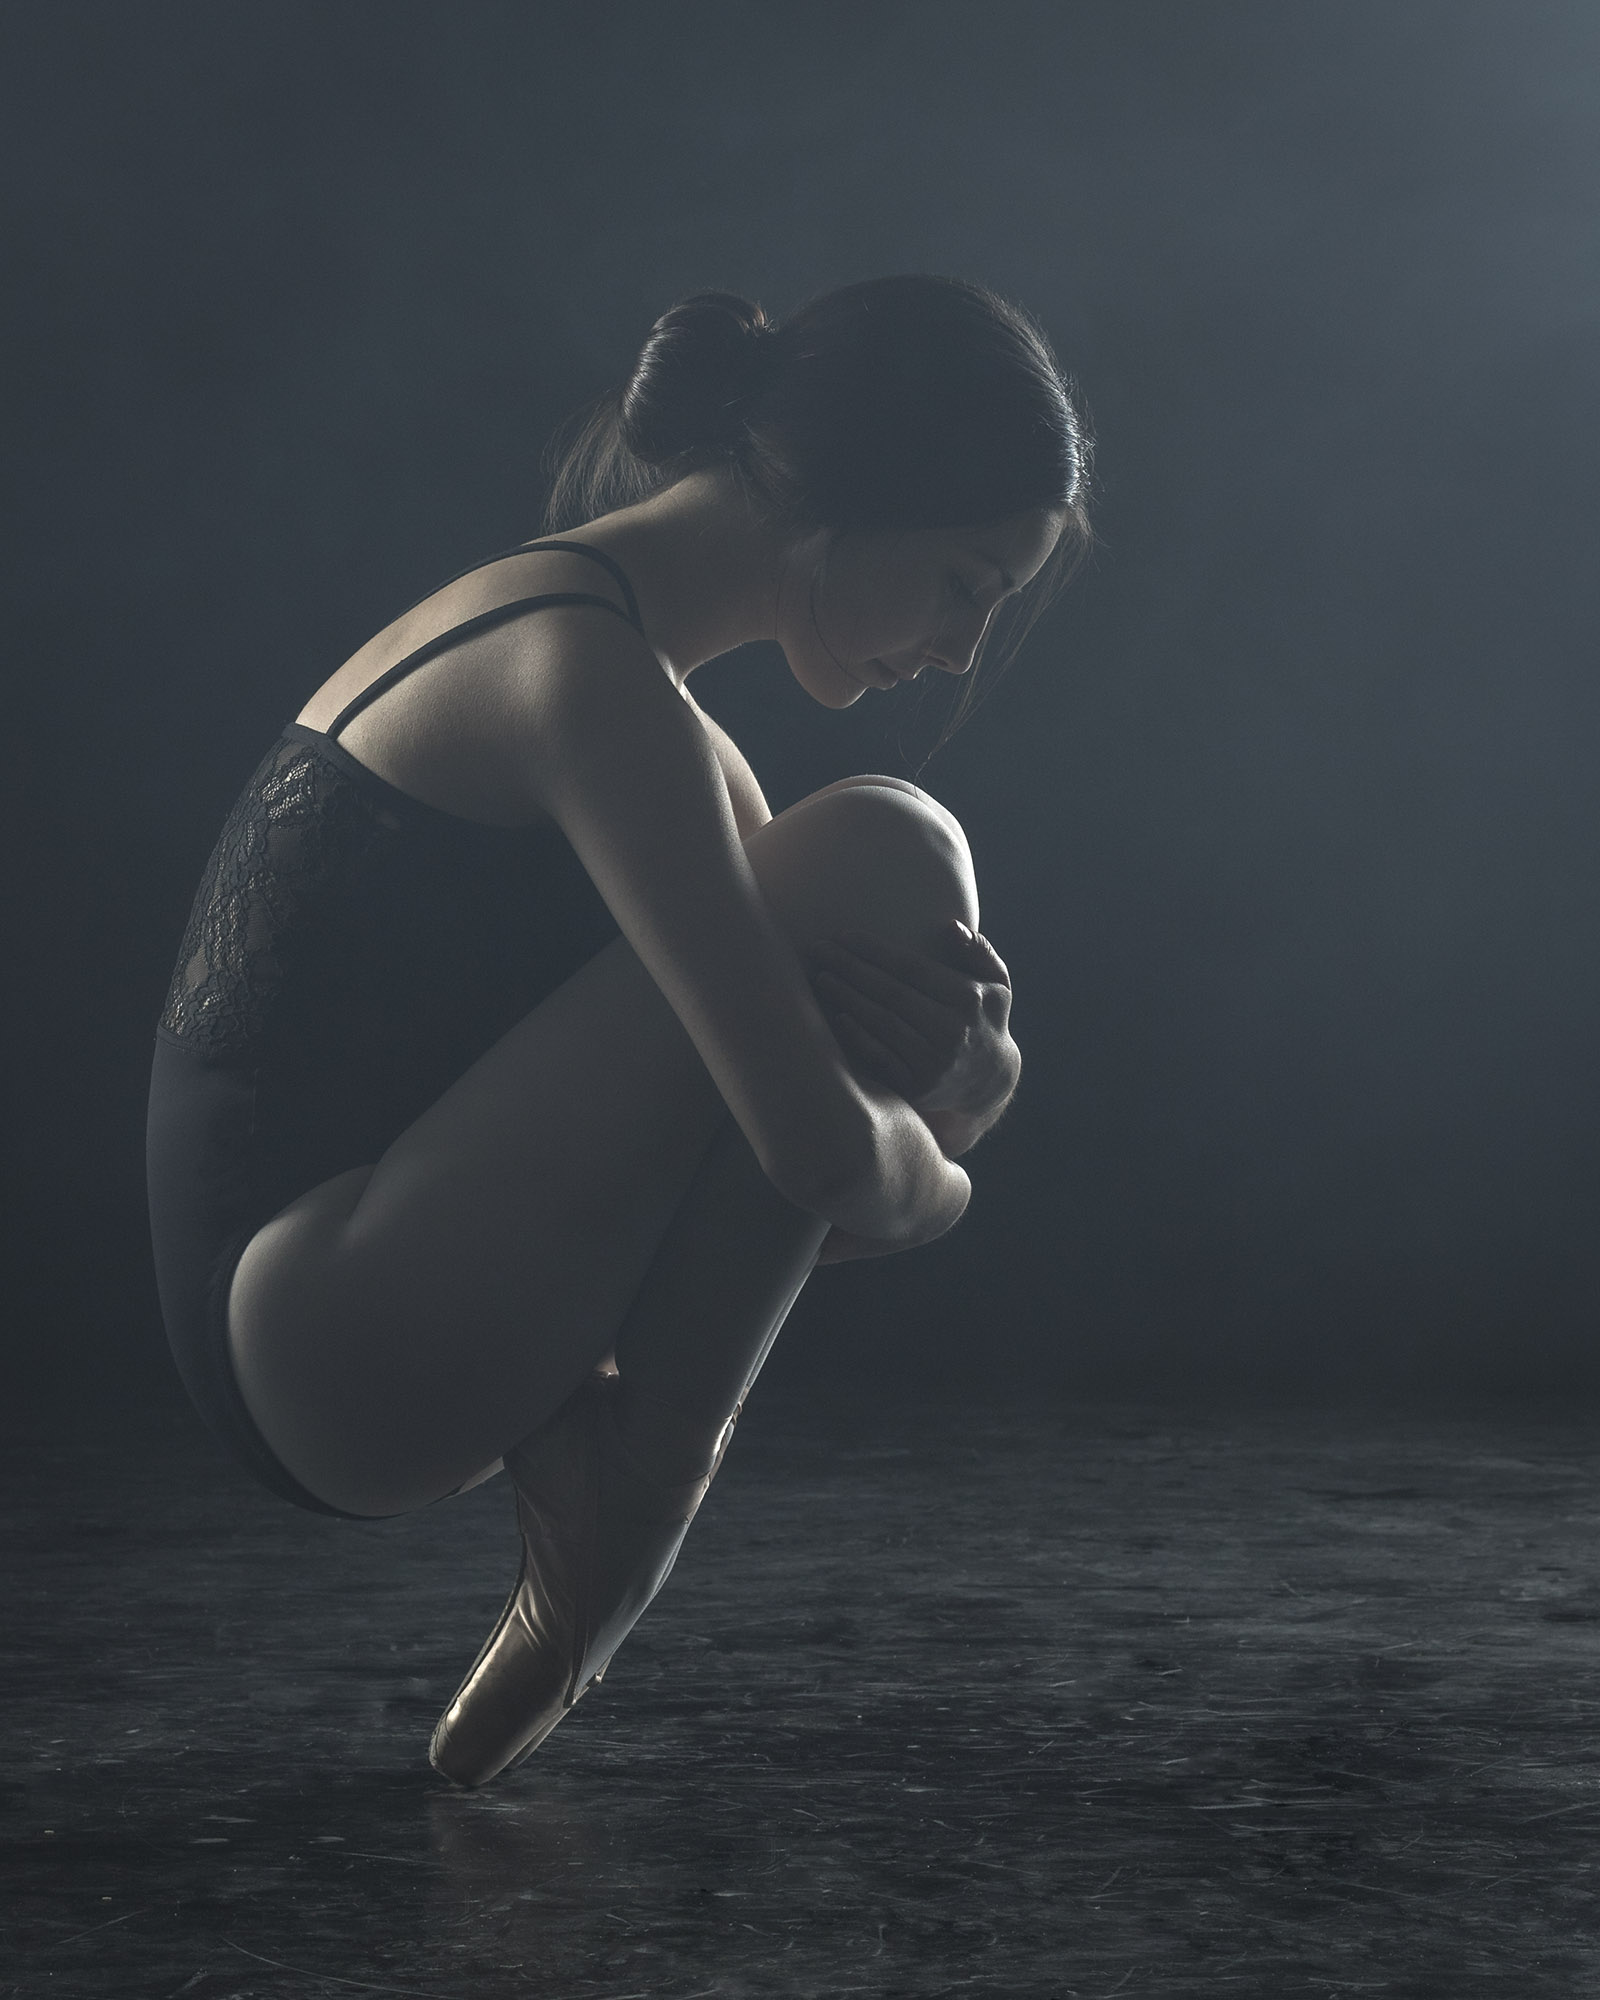 ballerina-crouching-en-pointe